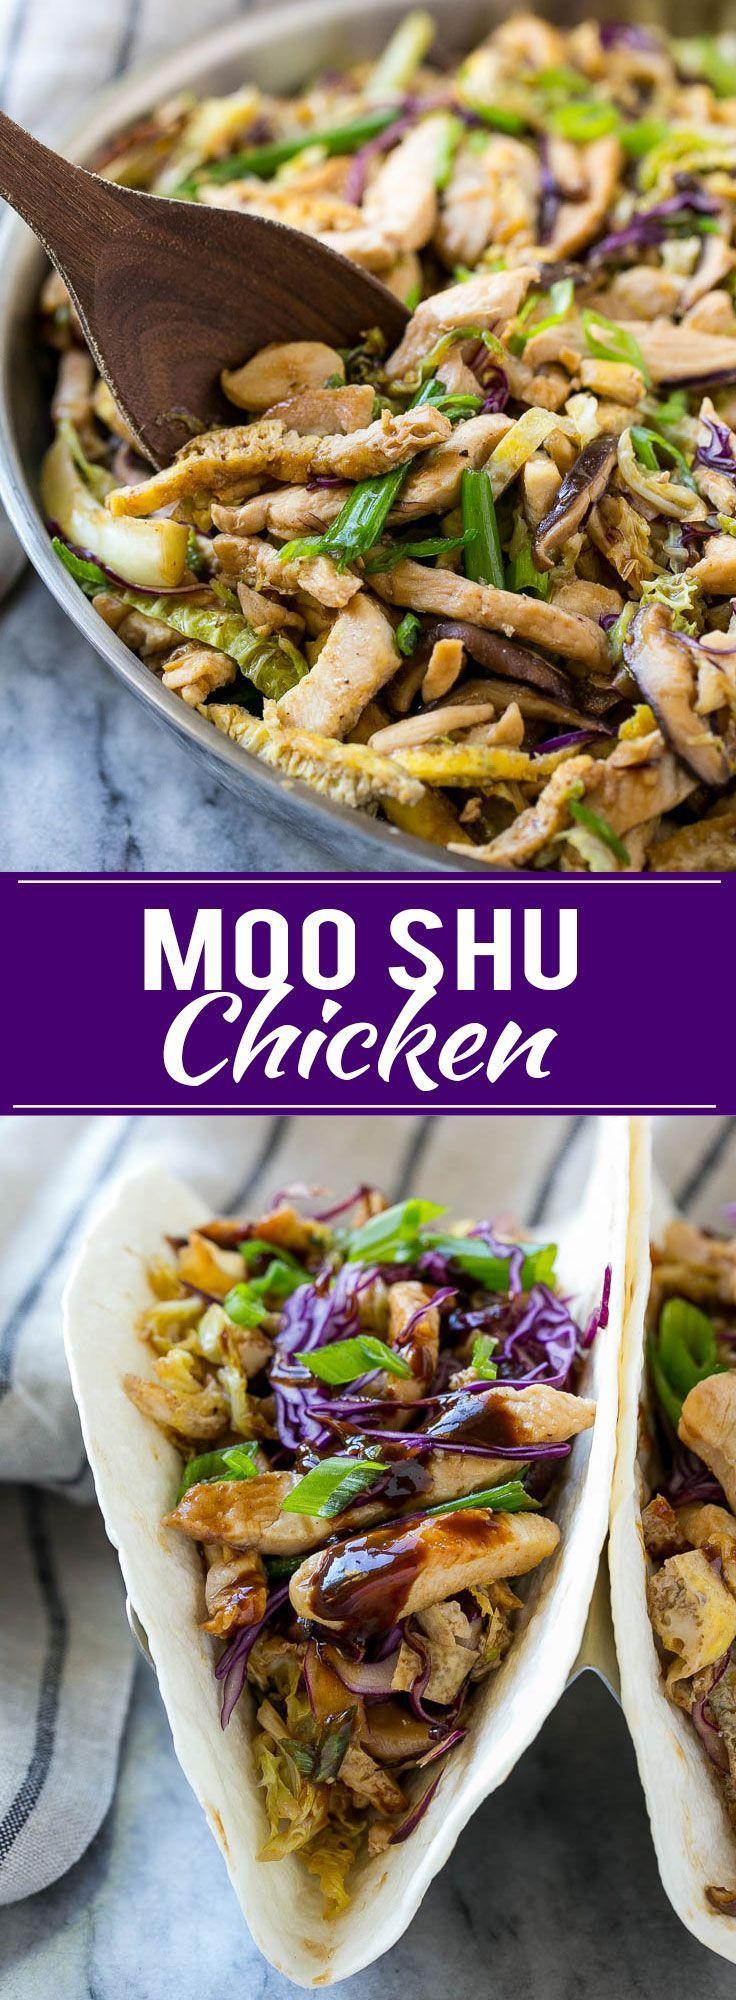 Mejores 3083 imgenes de chinese food recipes en pinterest cocinar moo shu chicken recipe chinese food recipe easy chicken recipe healthy chicken recipe forumfinder Gallery